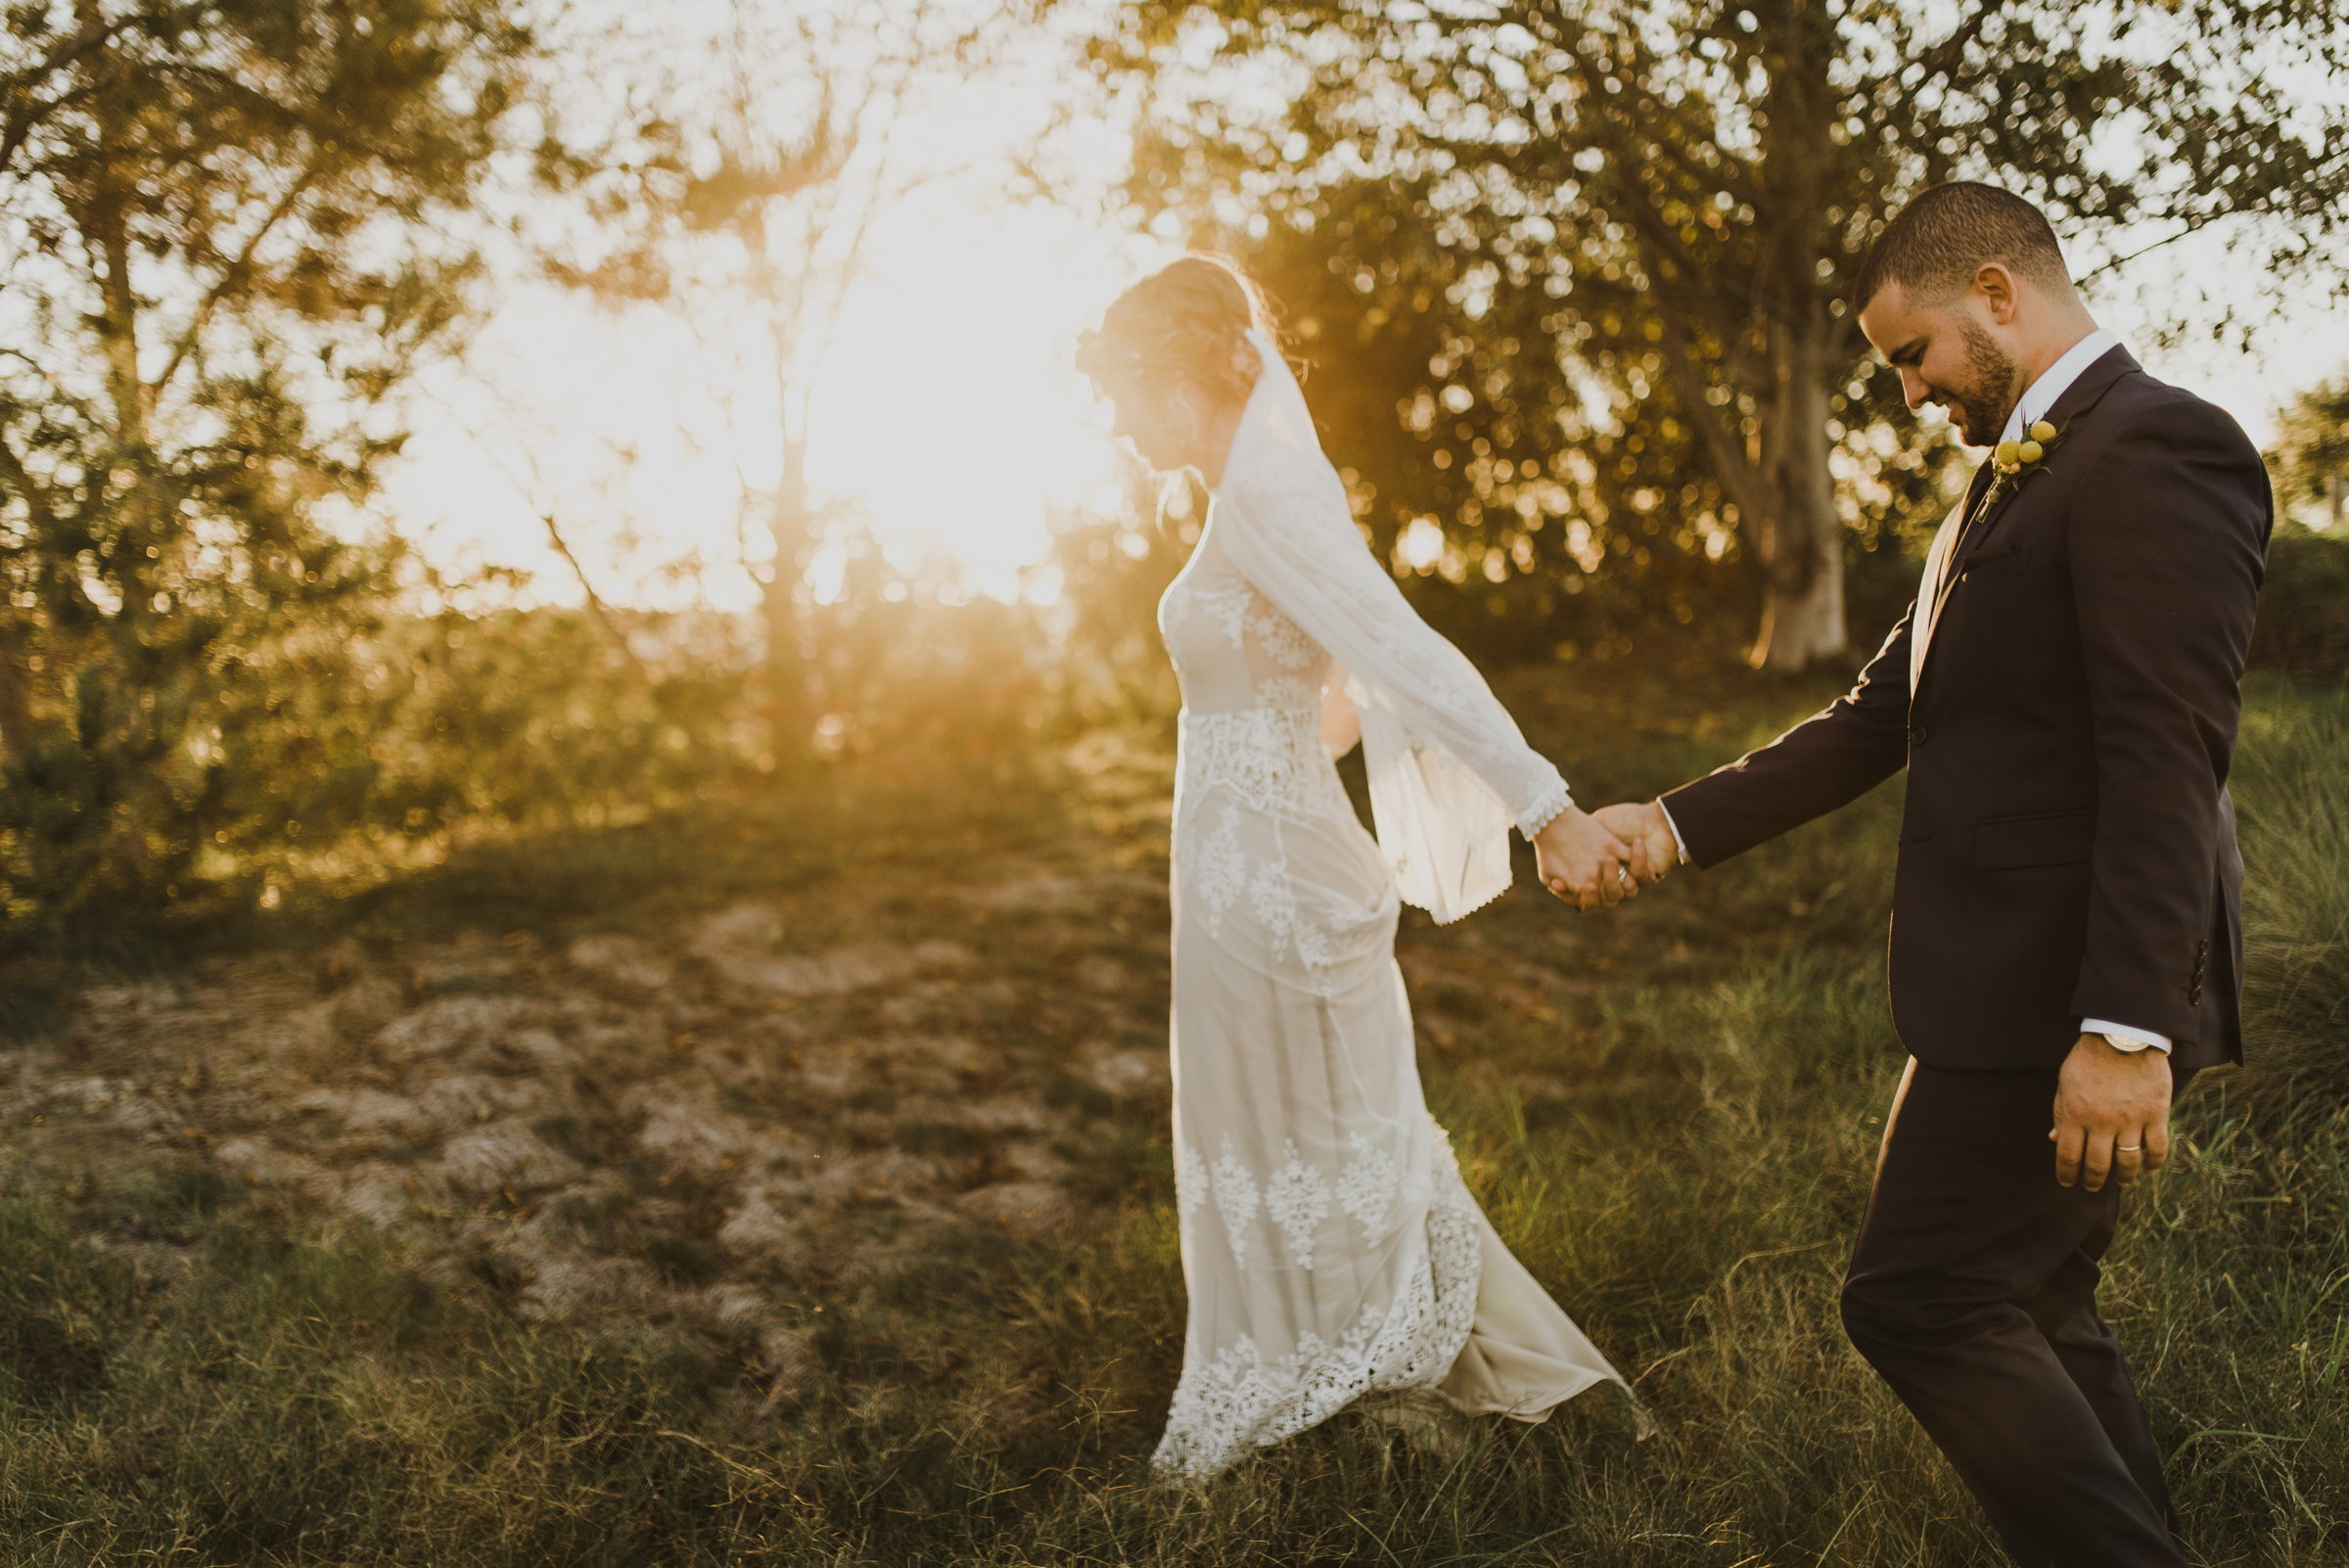 ©Isaiah + Taylor Photography - The Woodshed Booze Brothers Wedding, Vista California Wedding Photographer-93.jpg